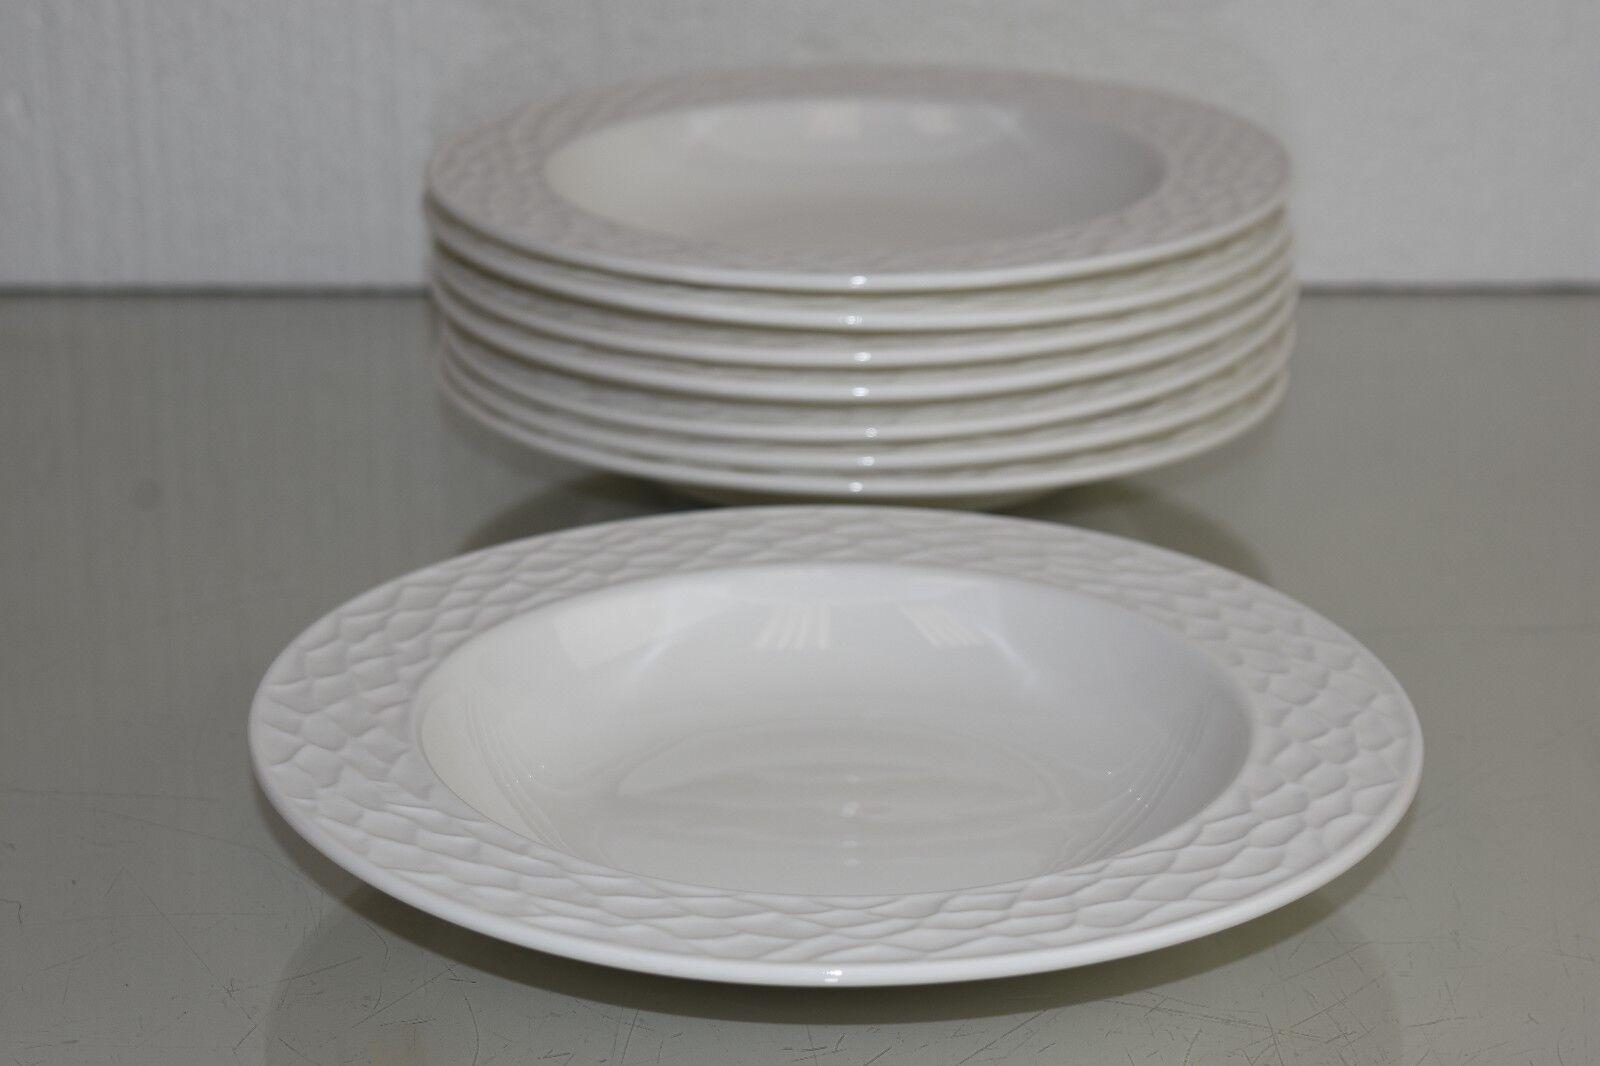 NEW Lenox damen Karan DEVORE 40 40 40 Pc for 8  Dinner Accent Plate Soup Bowl Cup Sauc 0ddb83